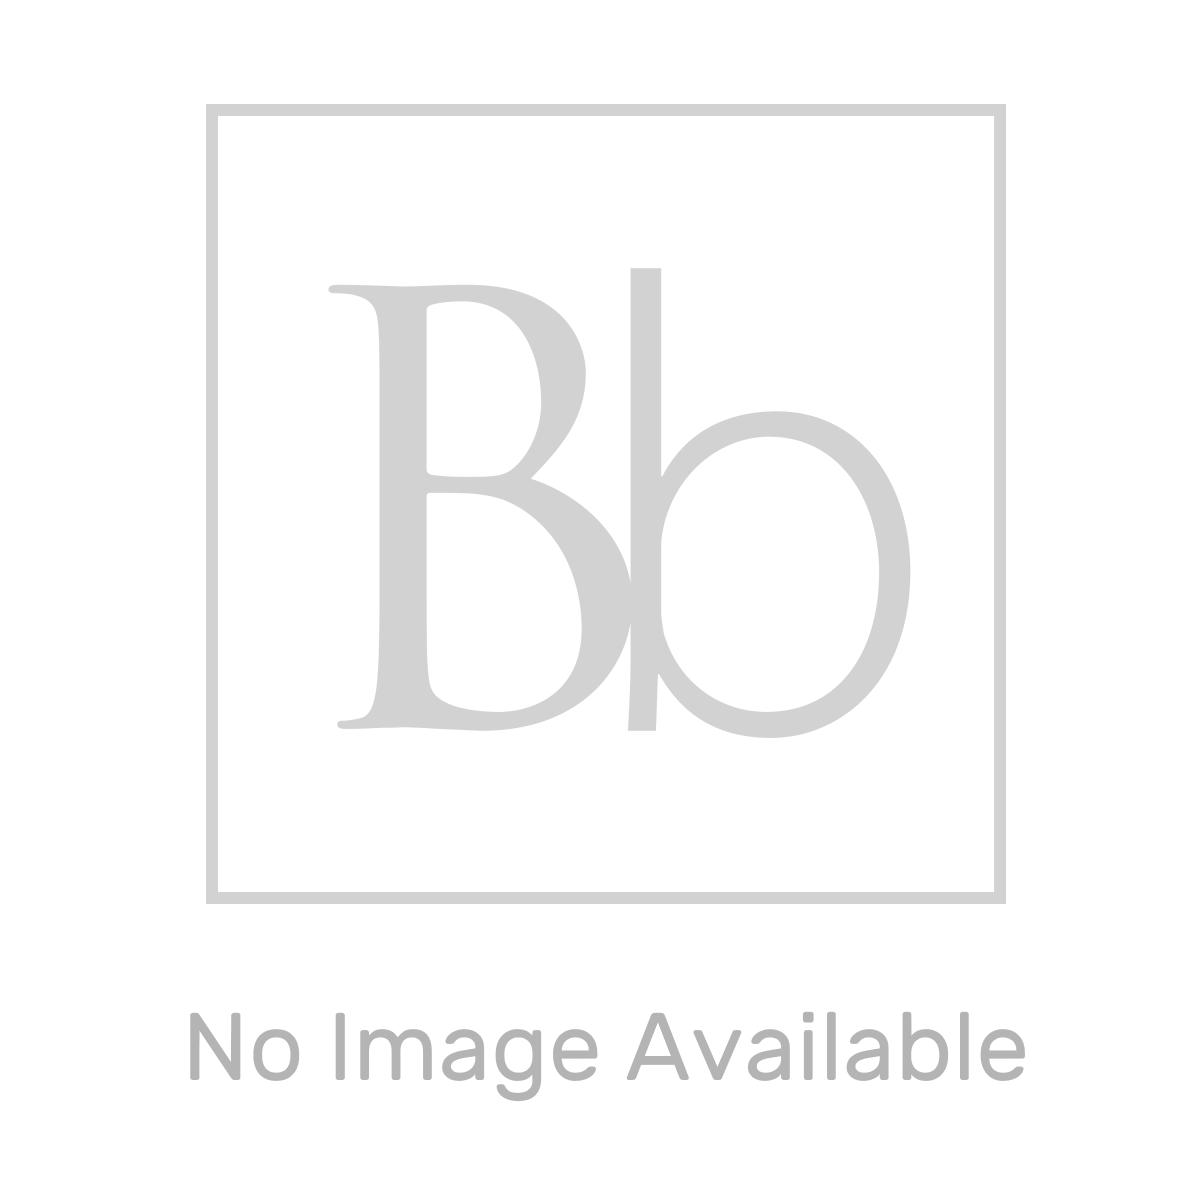 Moods Modern White Gloss Acrylic Front Bath Panel 1700mm